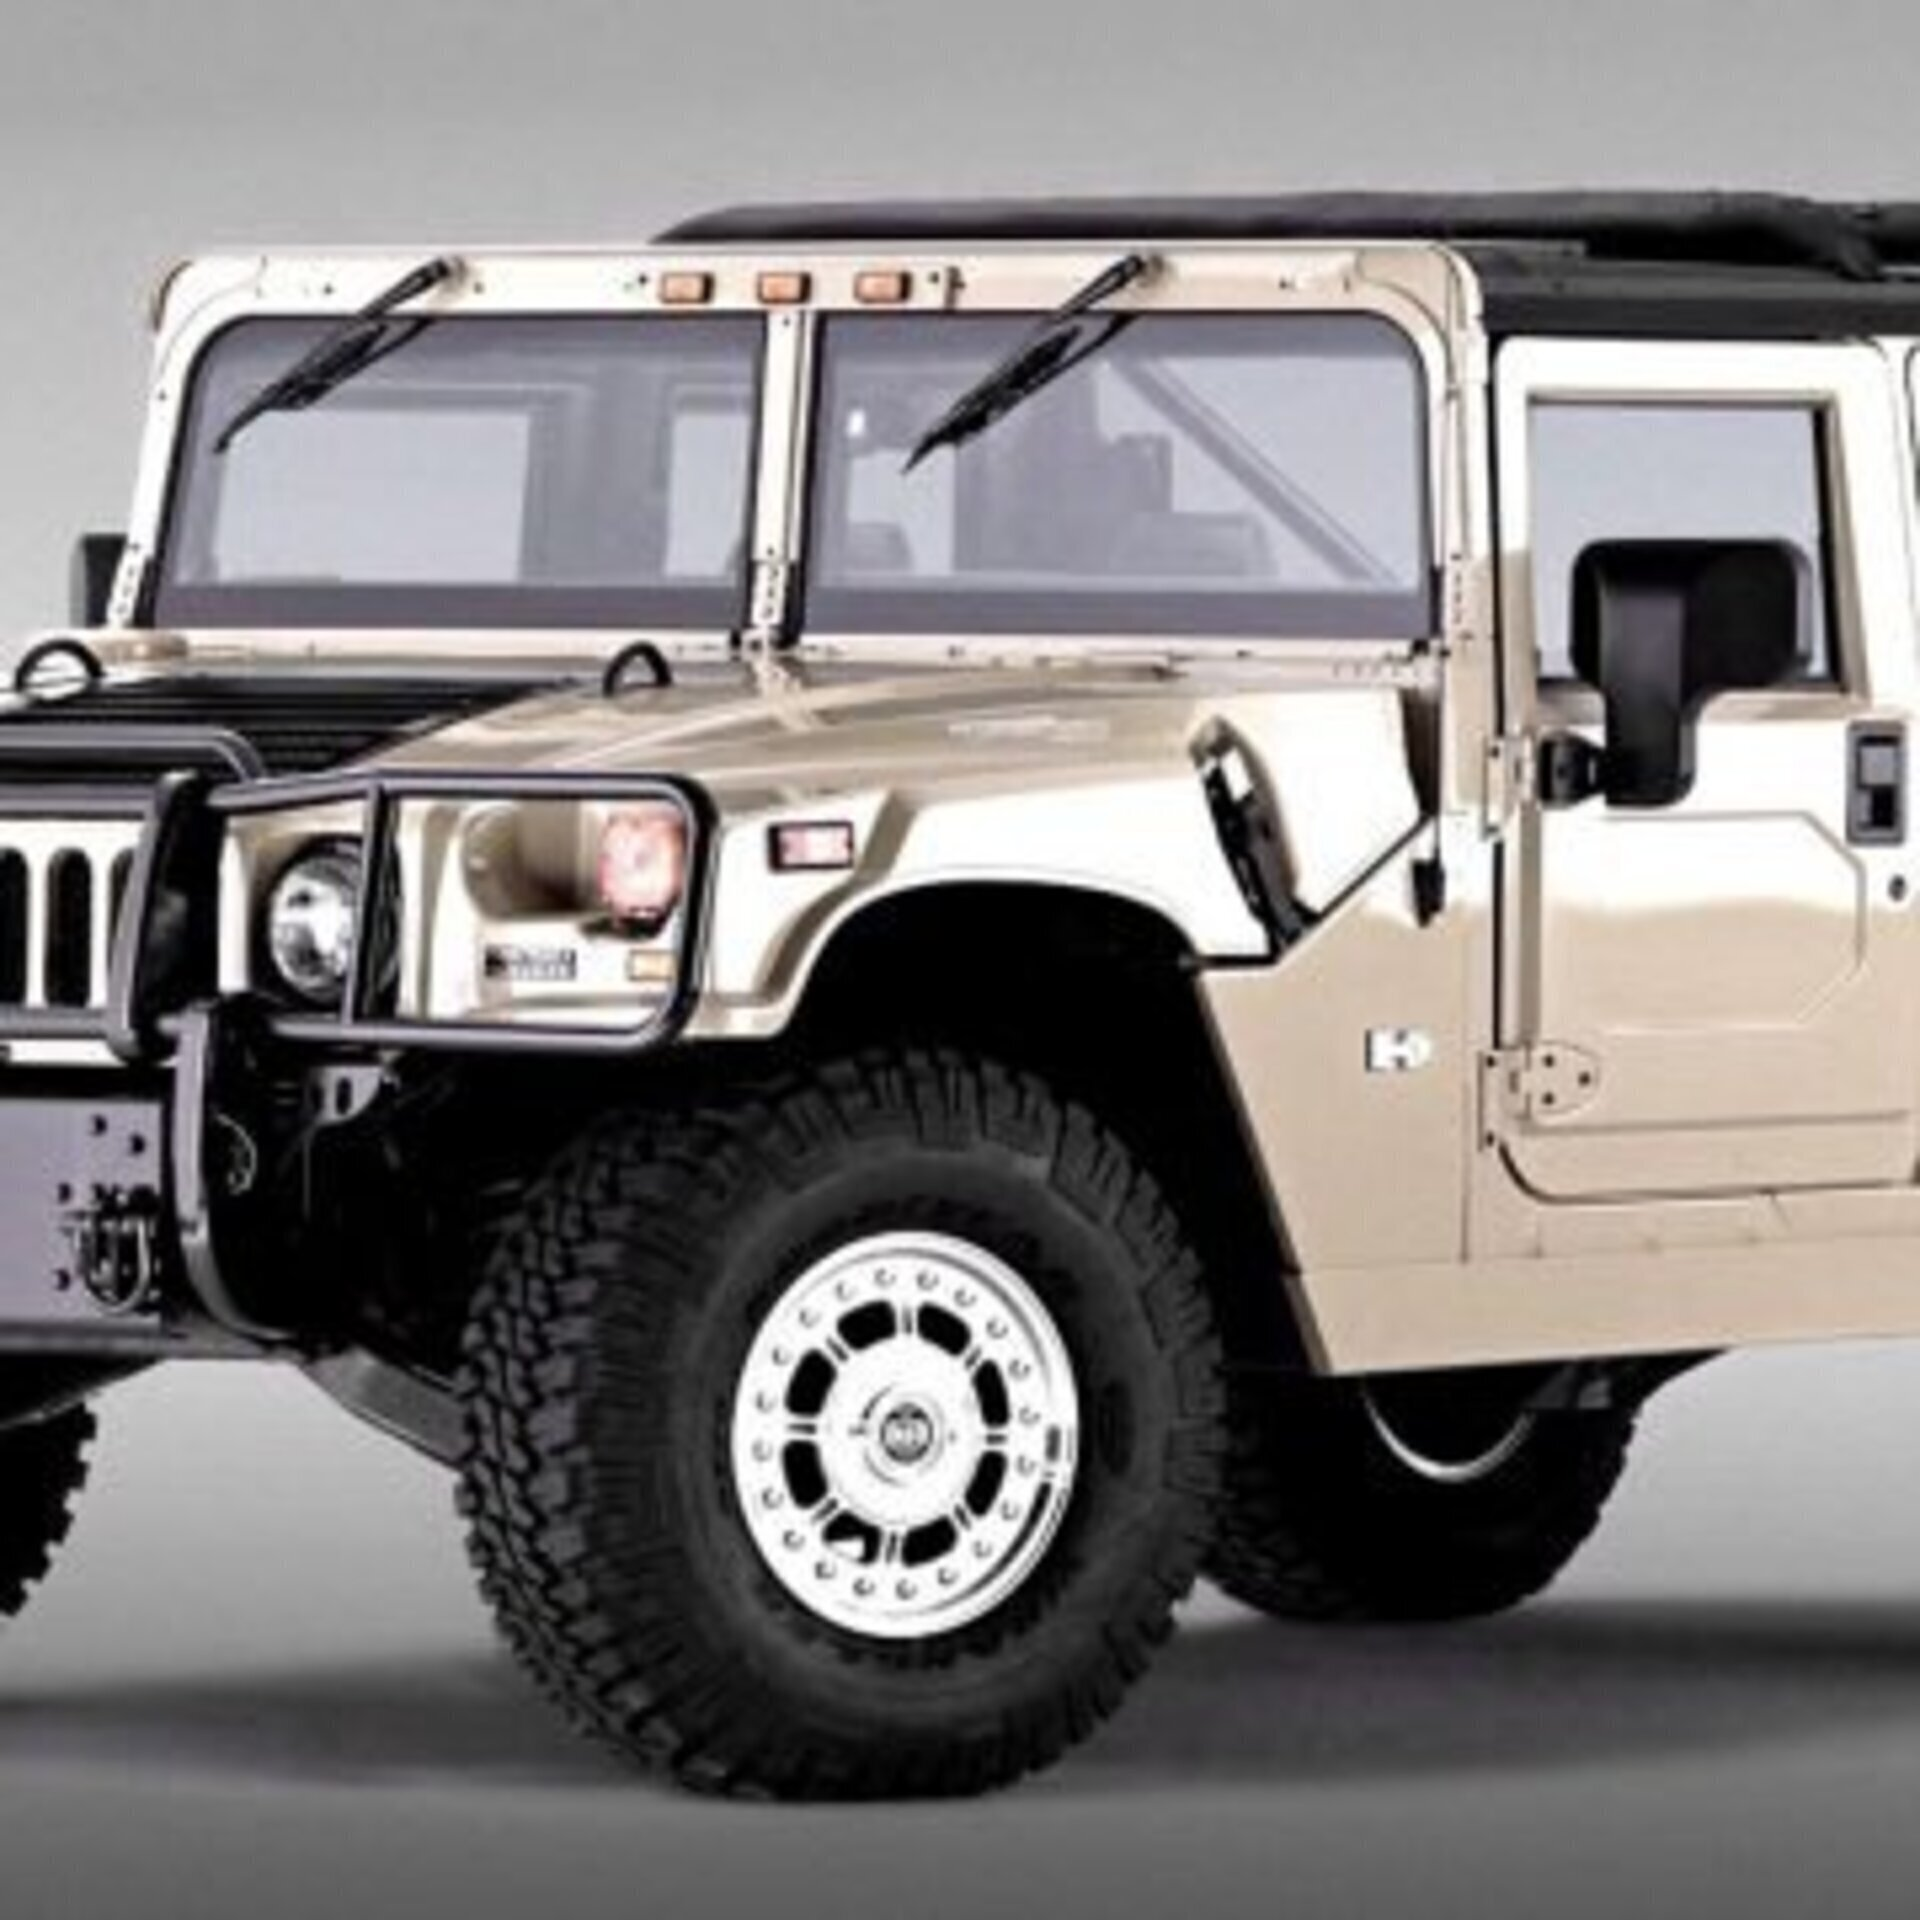 Scheda tecnica rimappatura centralina Hummer H1